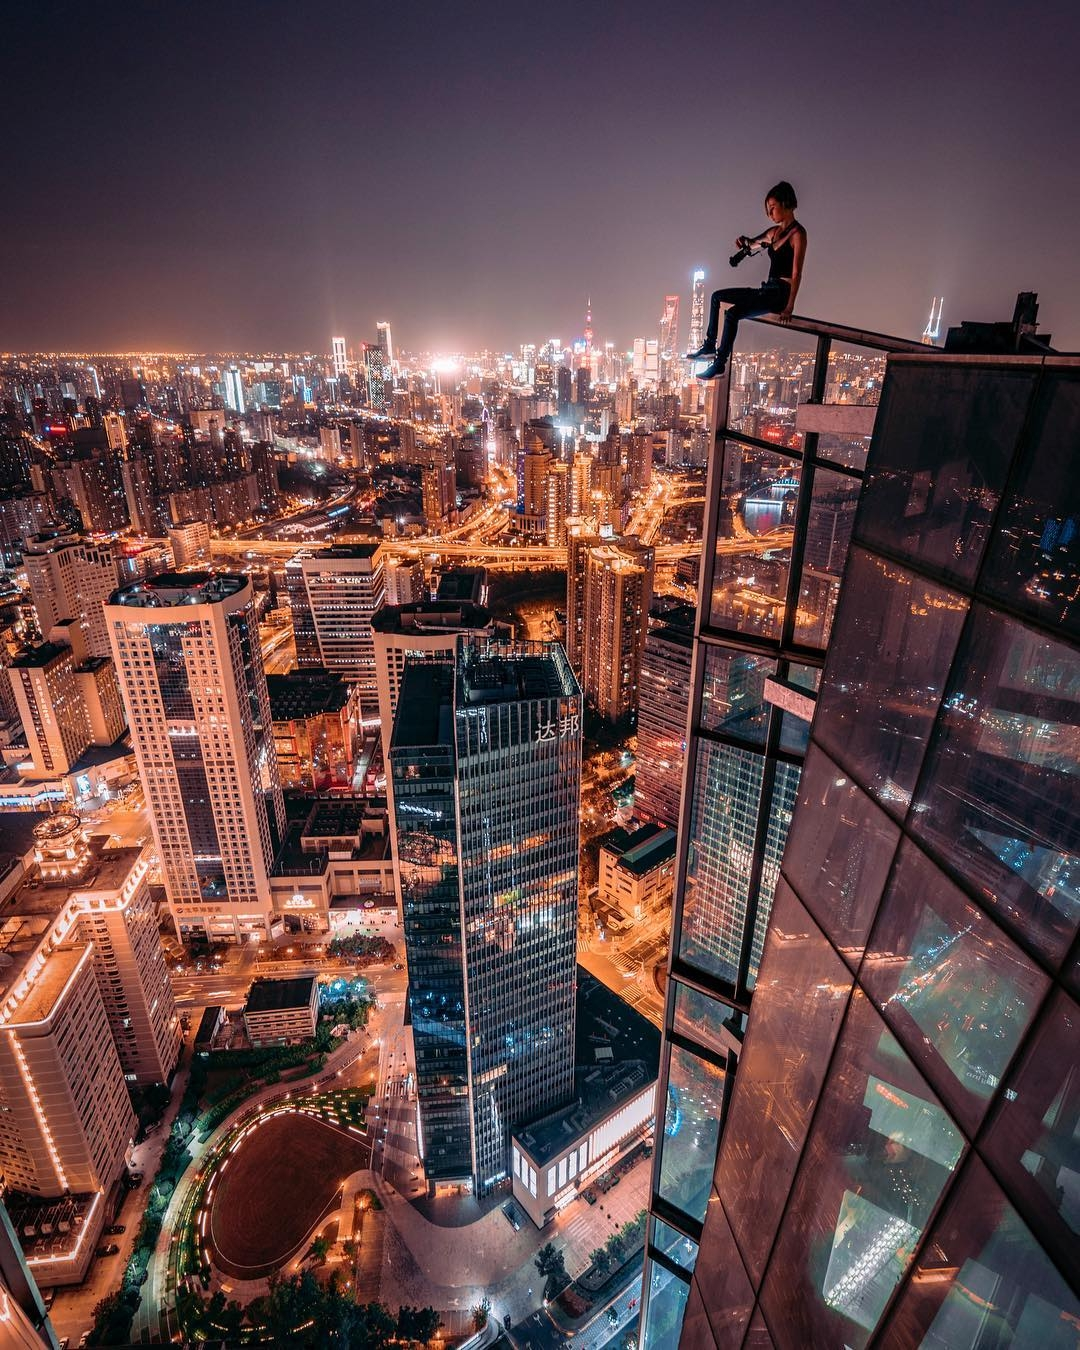 Outstanding Cityscape Rooftop P - photogrist   ello